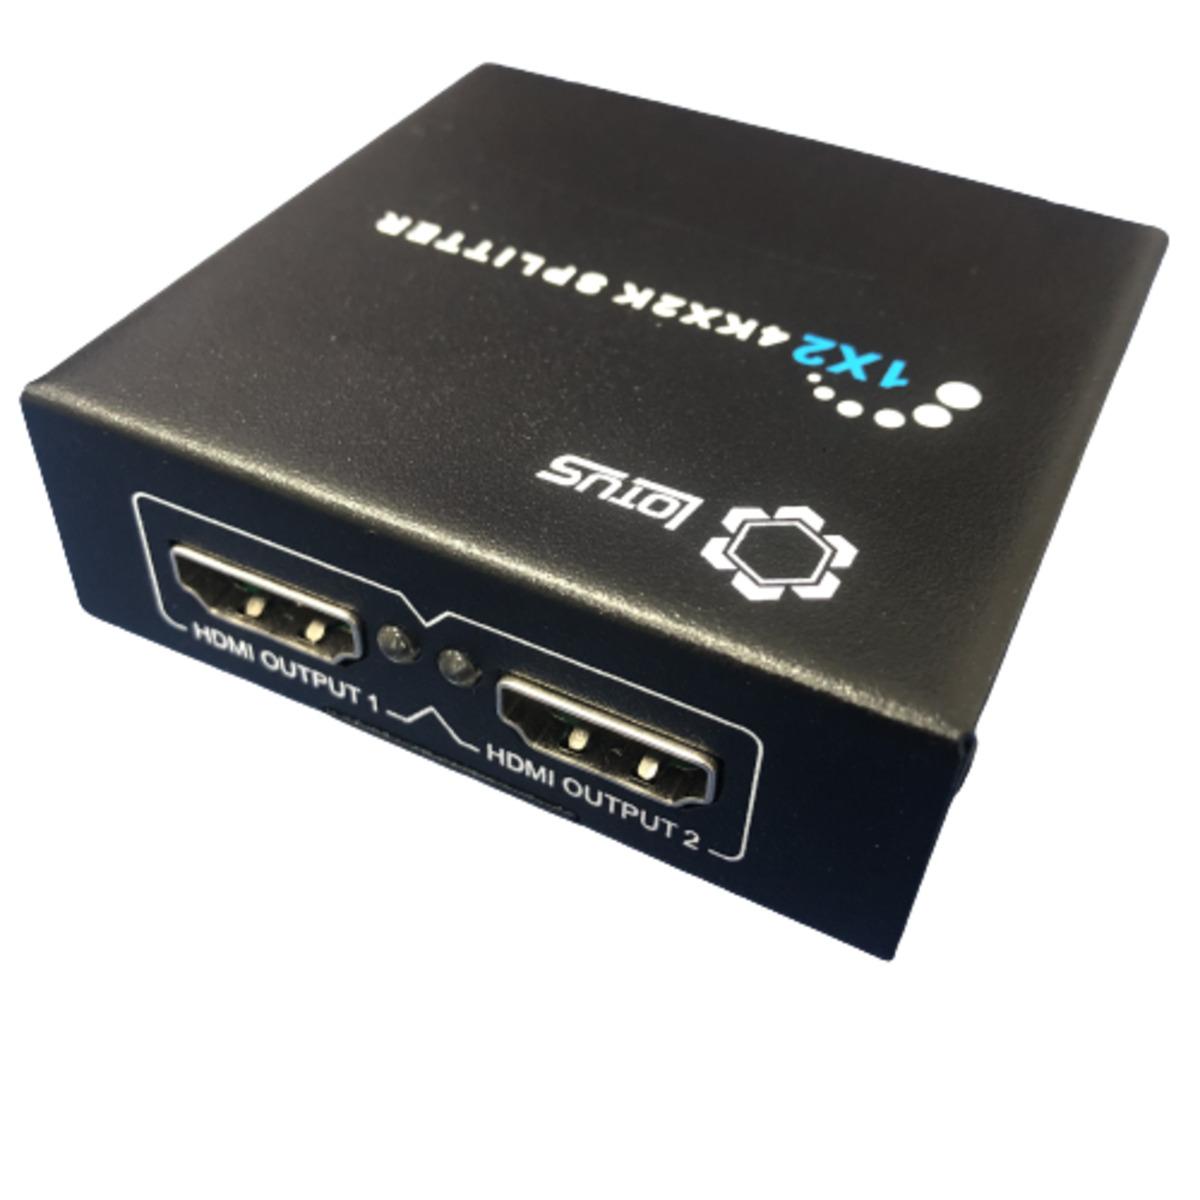 Splitter Divisor de Sinal HDMI para 2 Saídas HDMI Preto LT142 Lotus